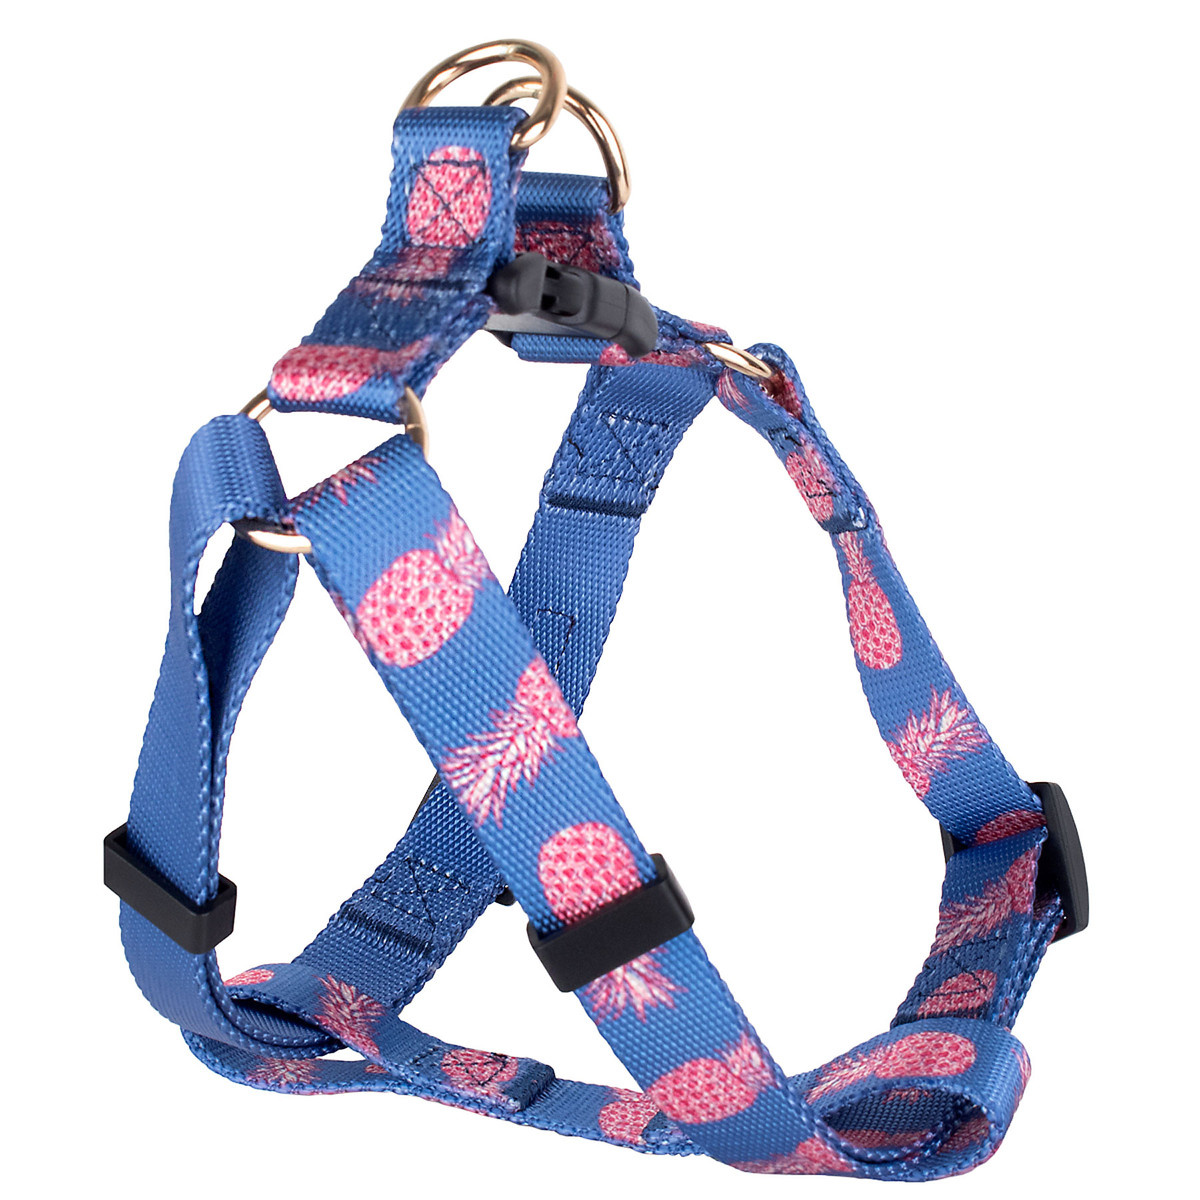 Boulevard Aloha Dog Harness